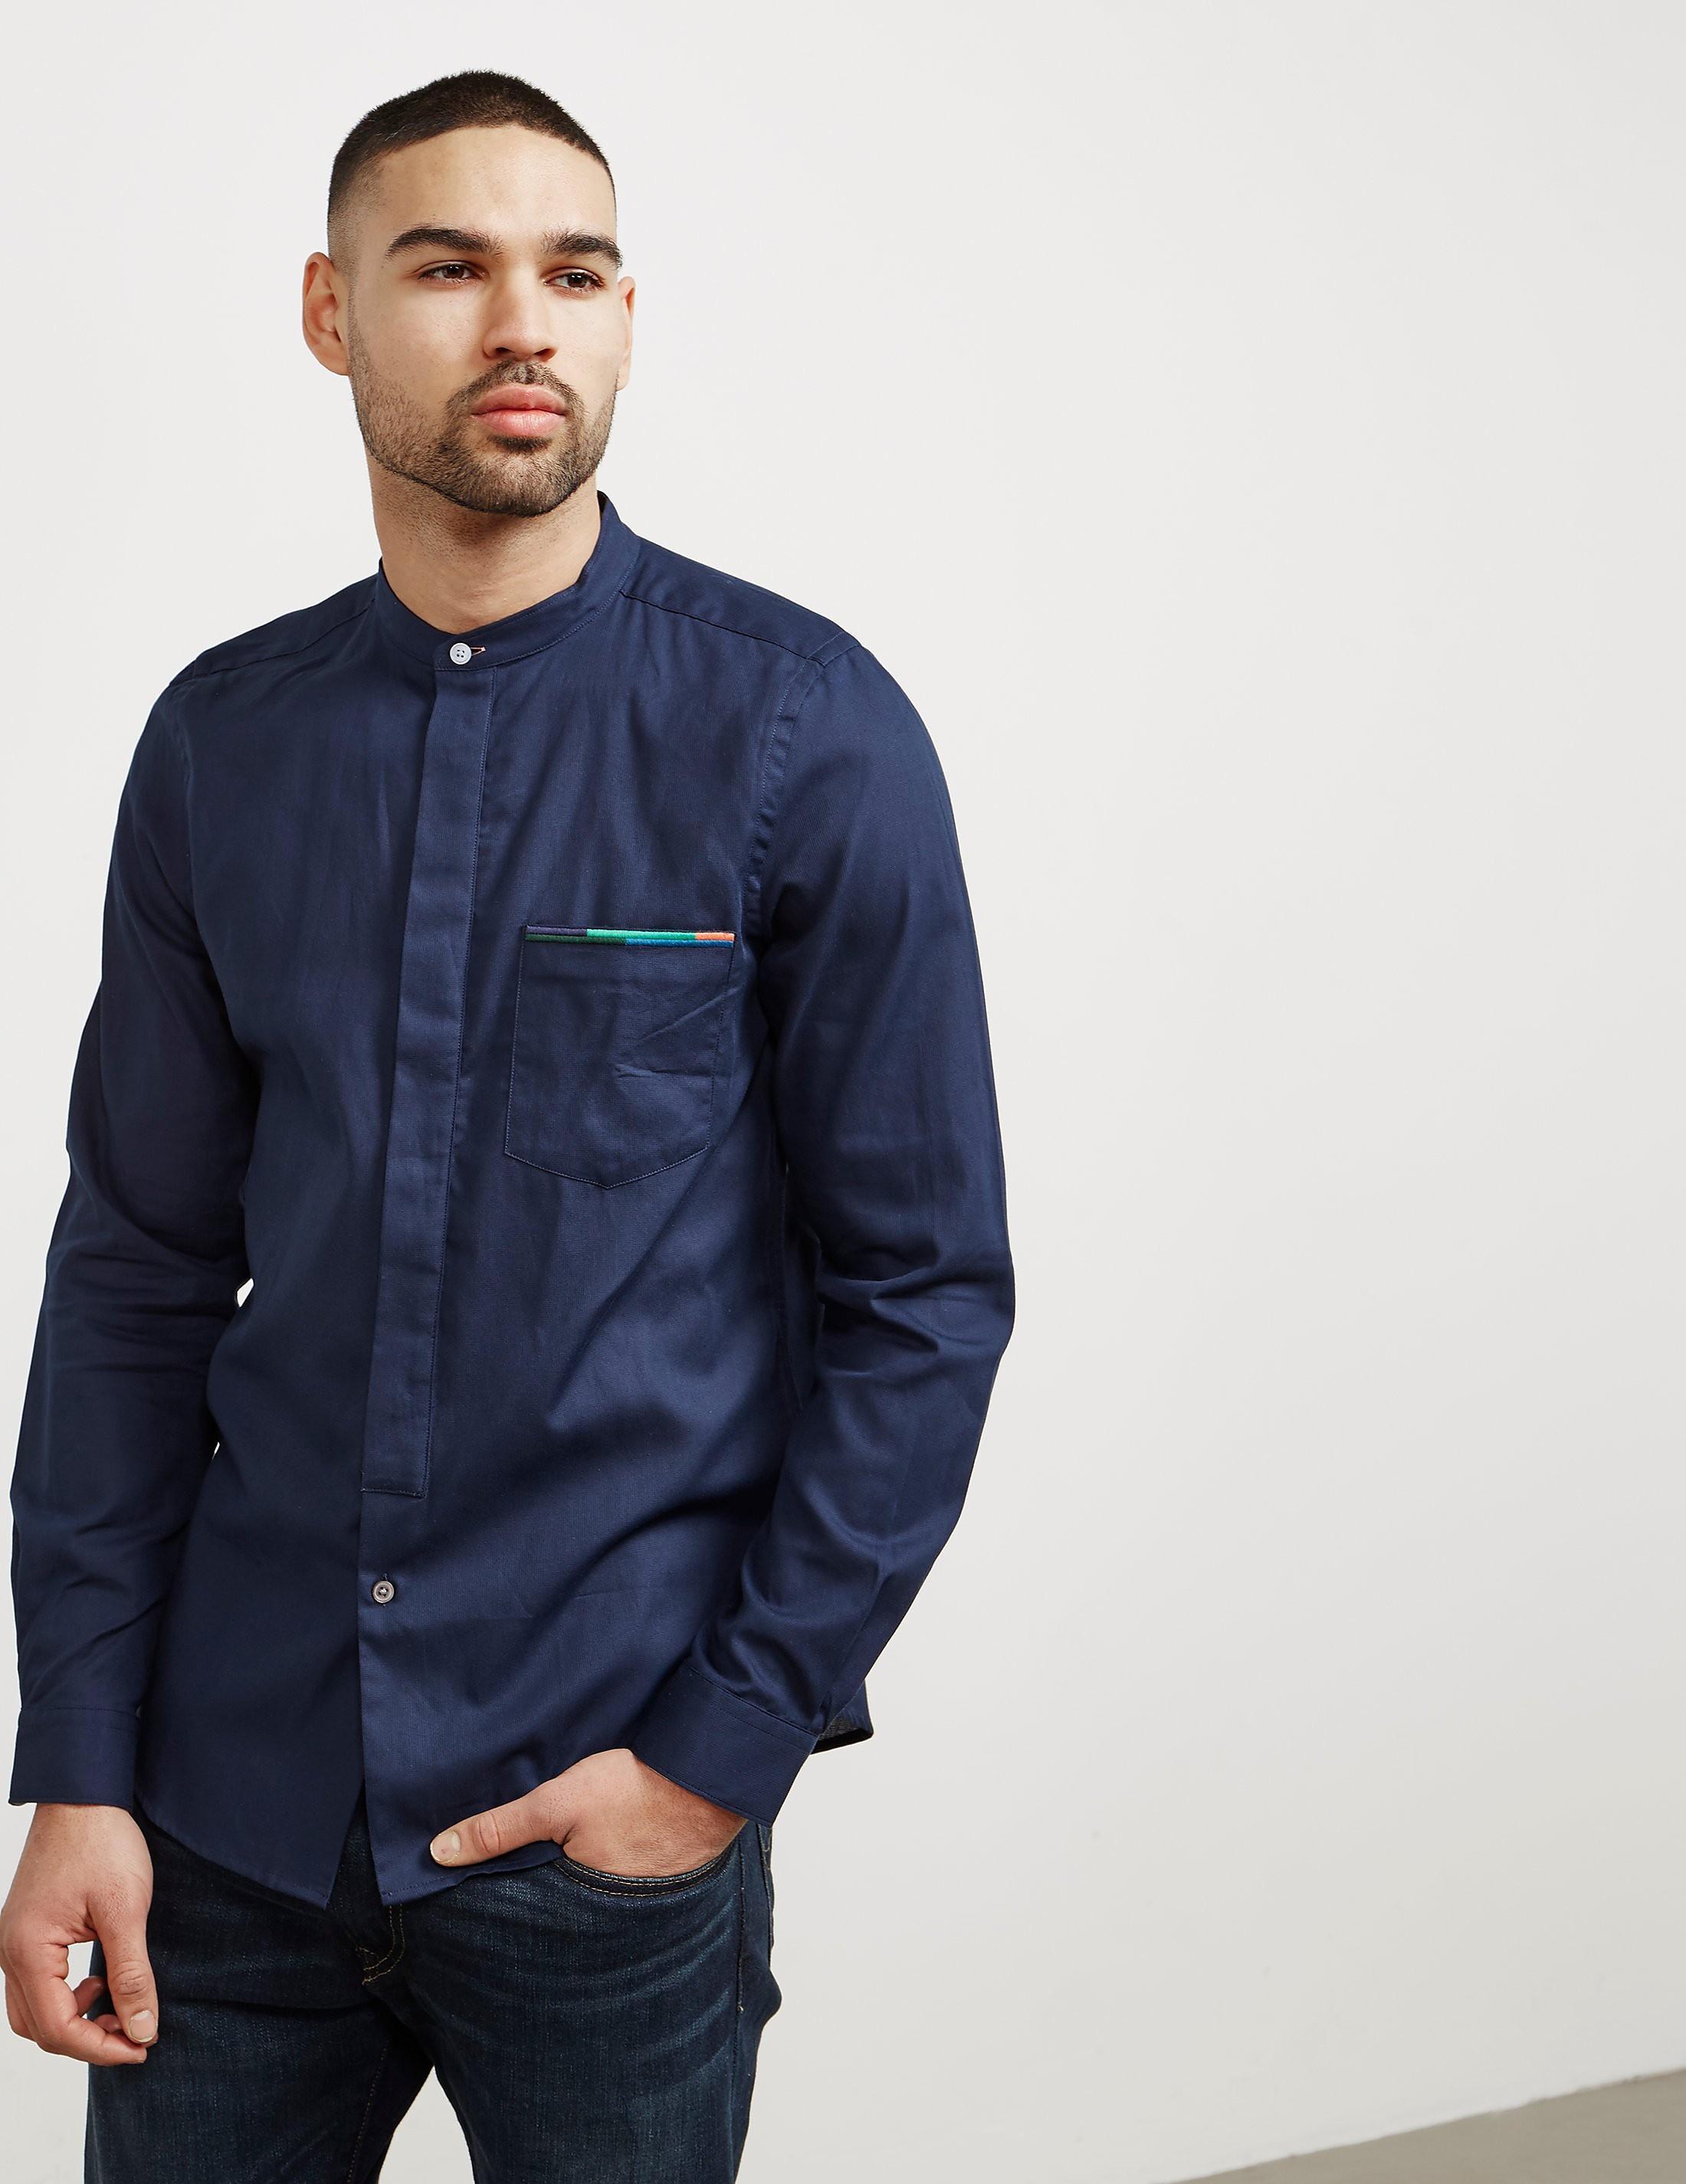 Paul Smith Pocket Granded Long Sleeve Shirt